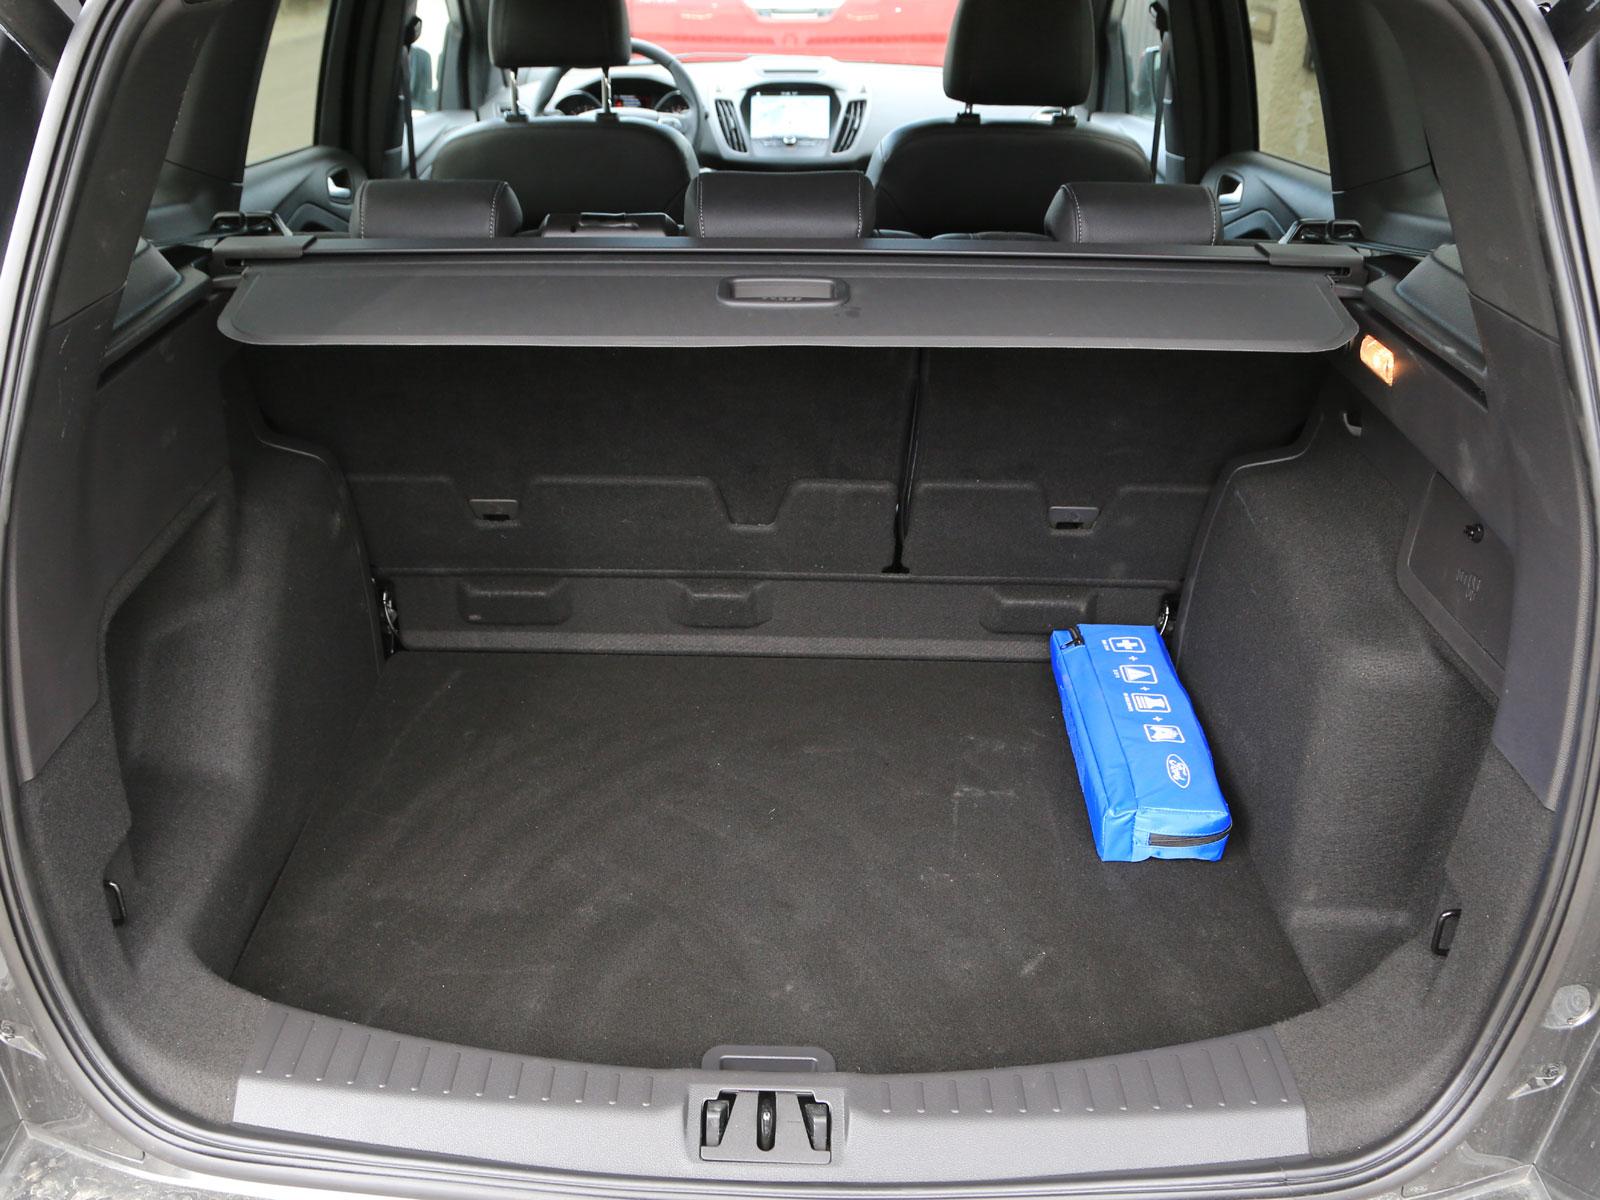 Image Result For Ford Kuga Kofferraumvolumen